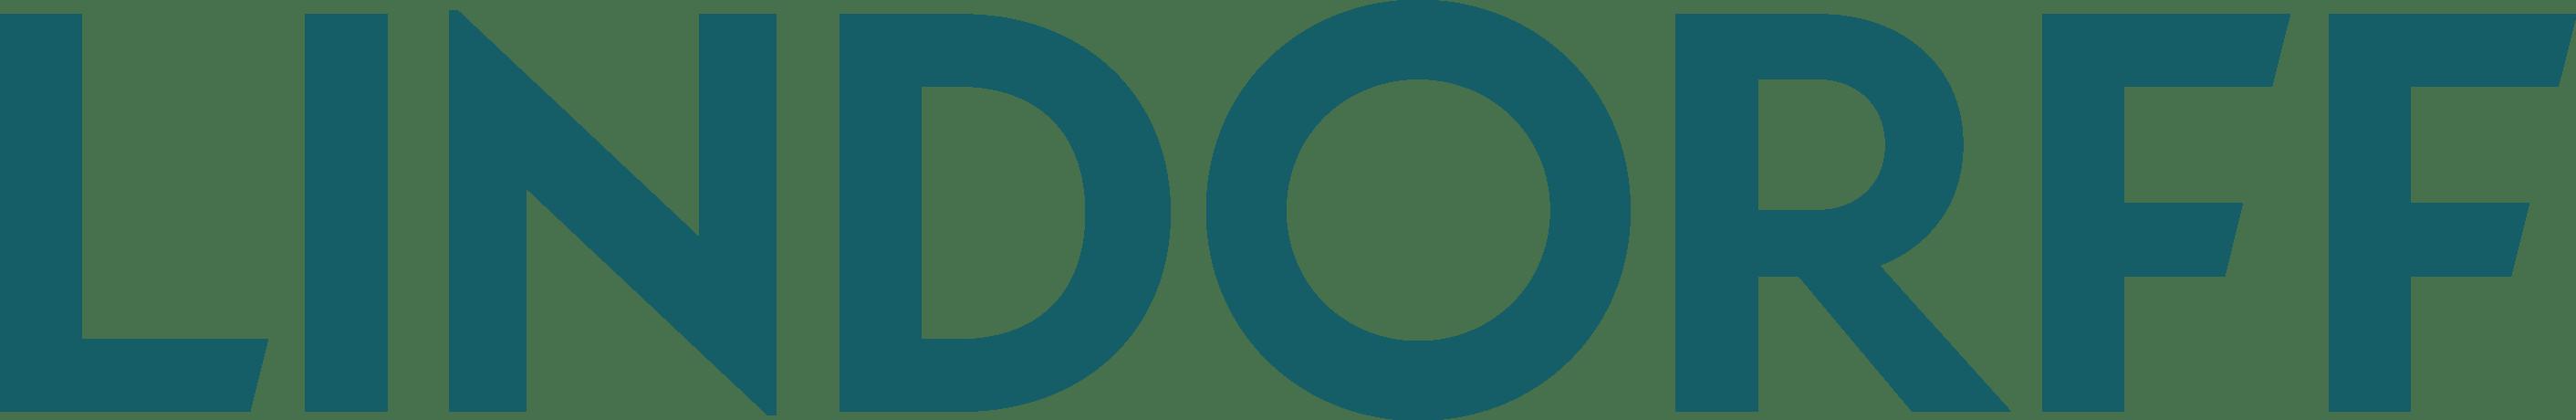 lindorff-logo-pms5473c_3547